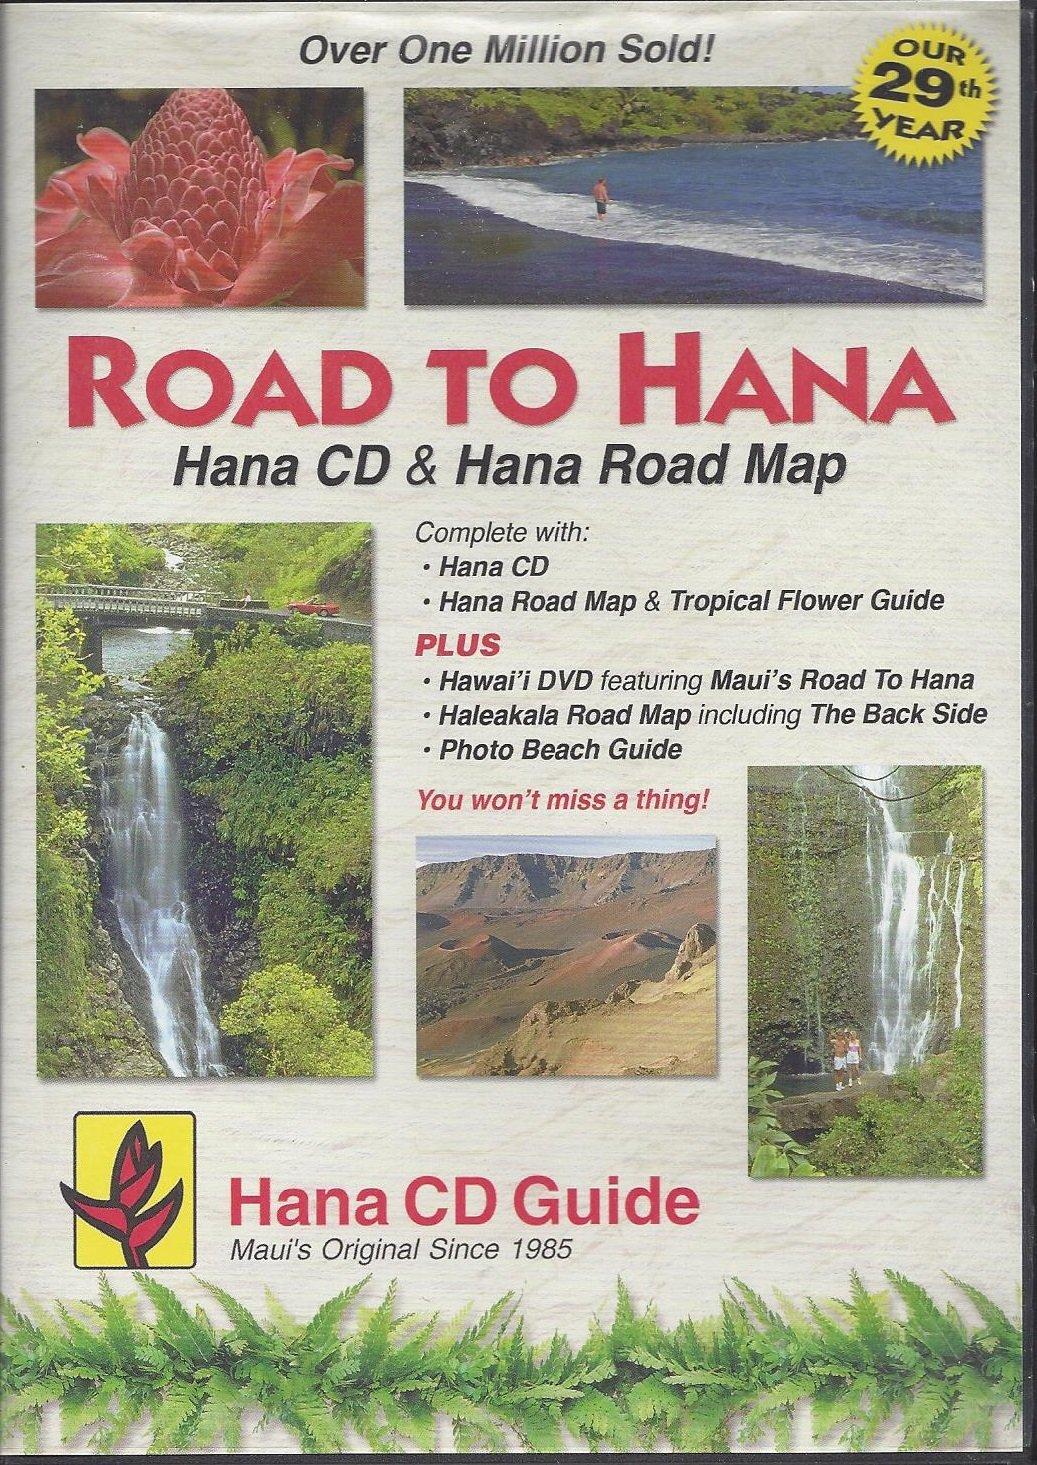 Road to Hana - Hana CD Guide: Hana CD and Hana Road Map Plus ...